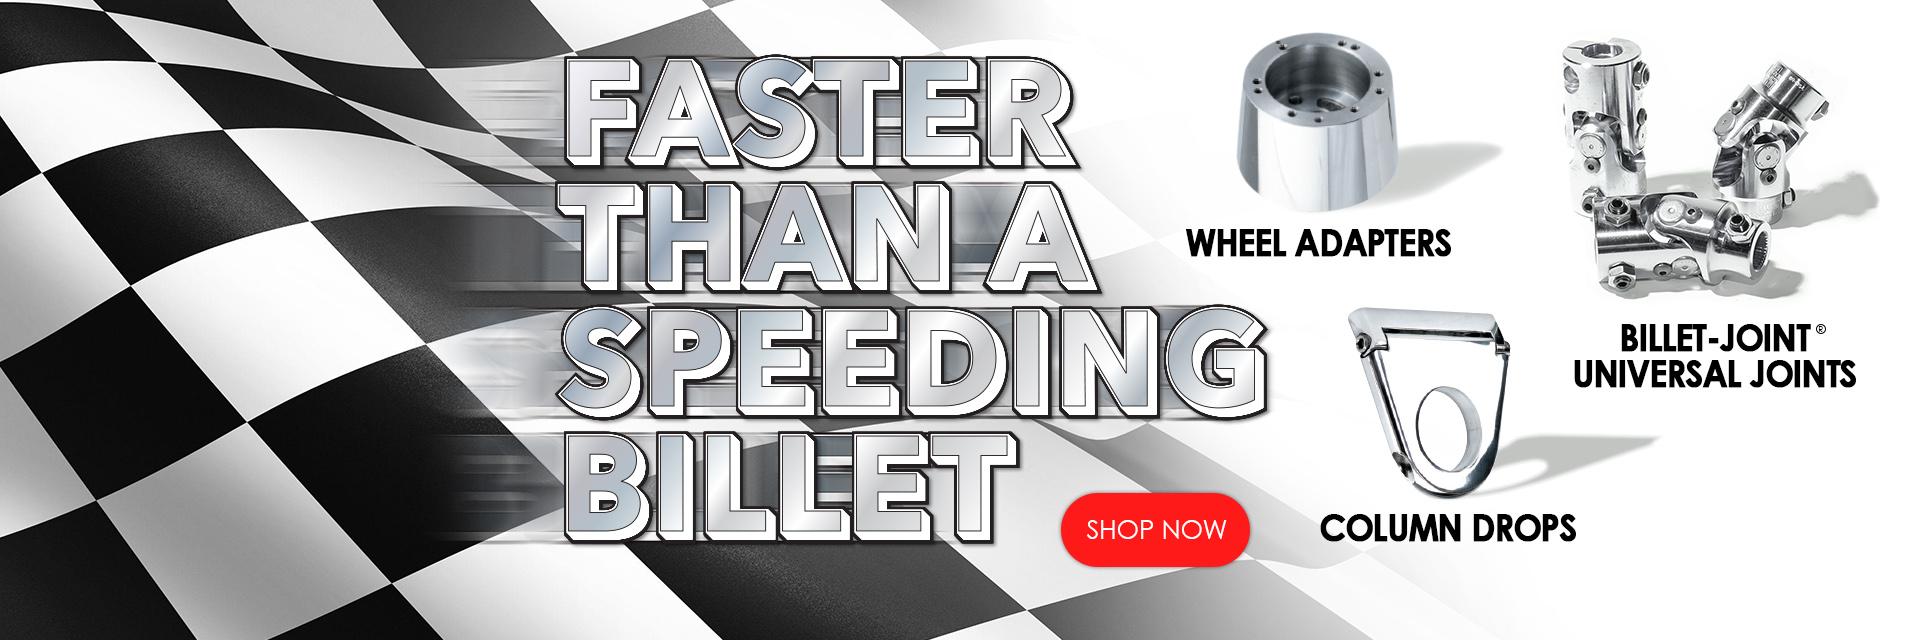 Faster than a speeding billet